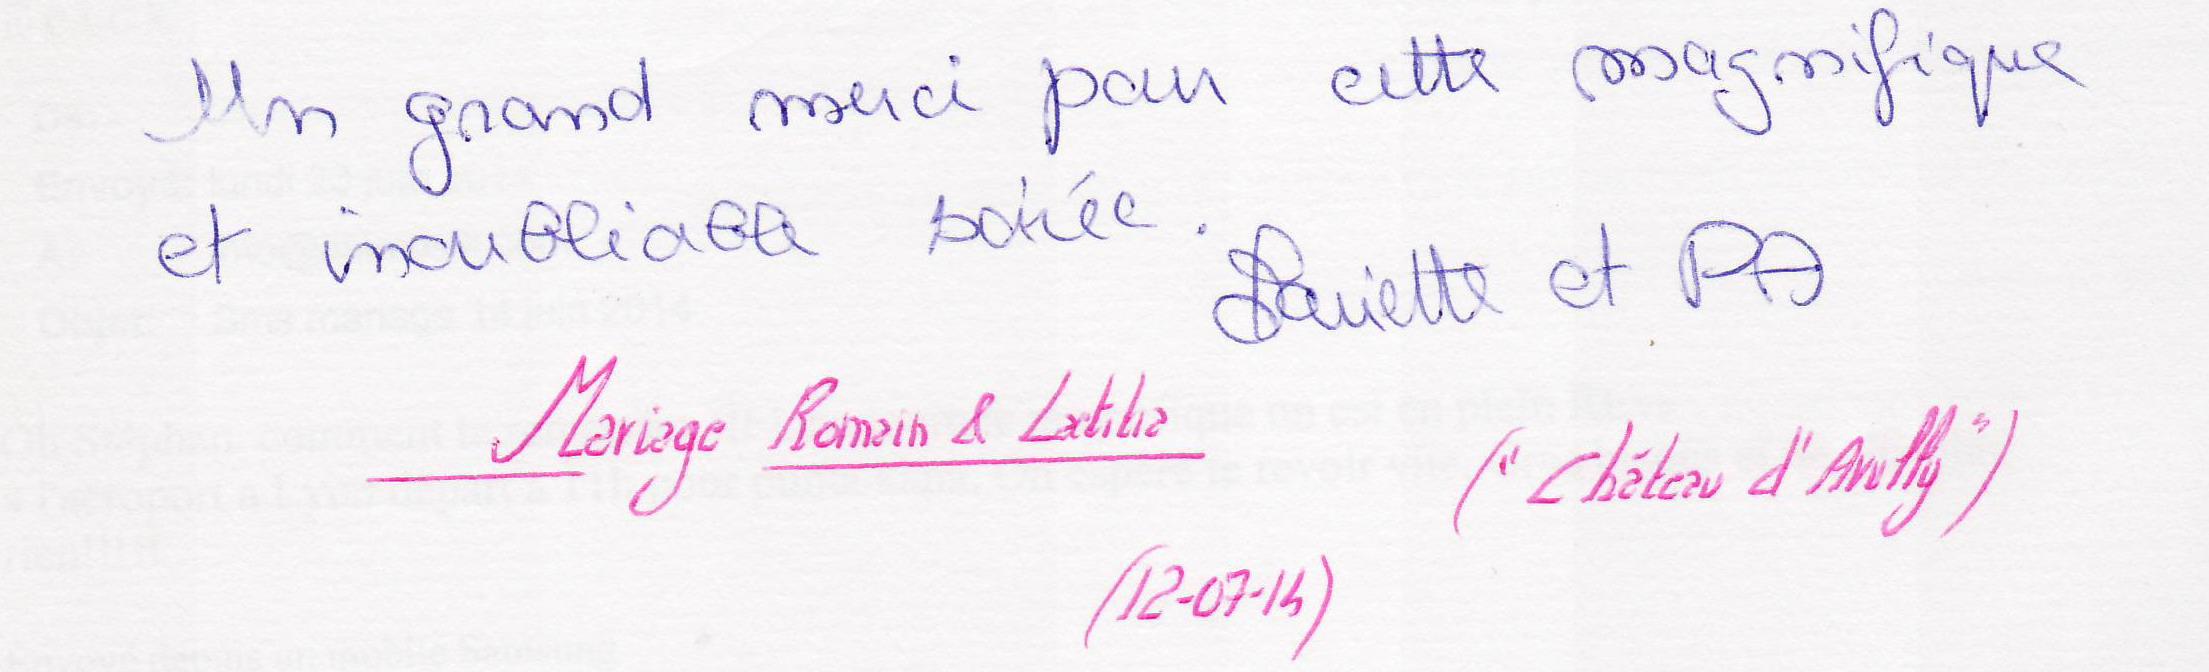 Mariage_CAPT_Romain_&_Laetitia_(Château_d'Avully)_(12-07-2014)